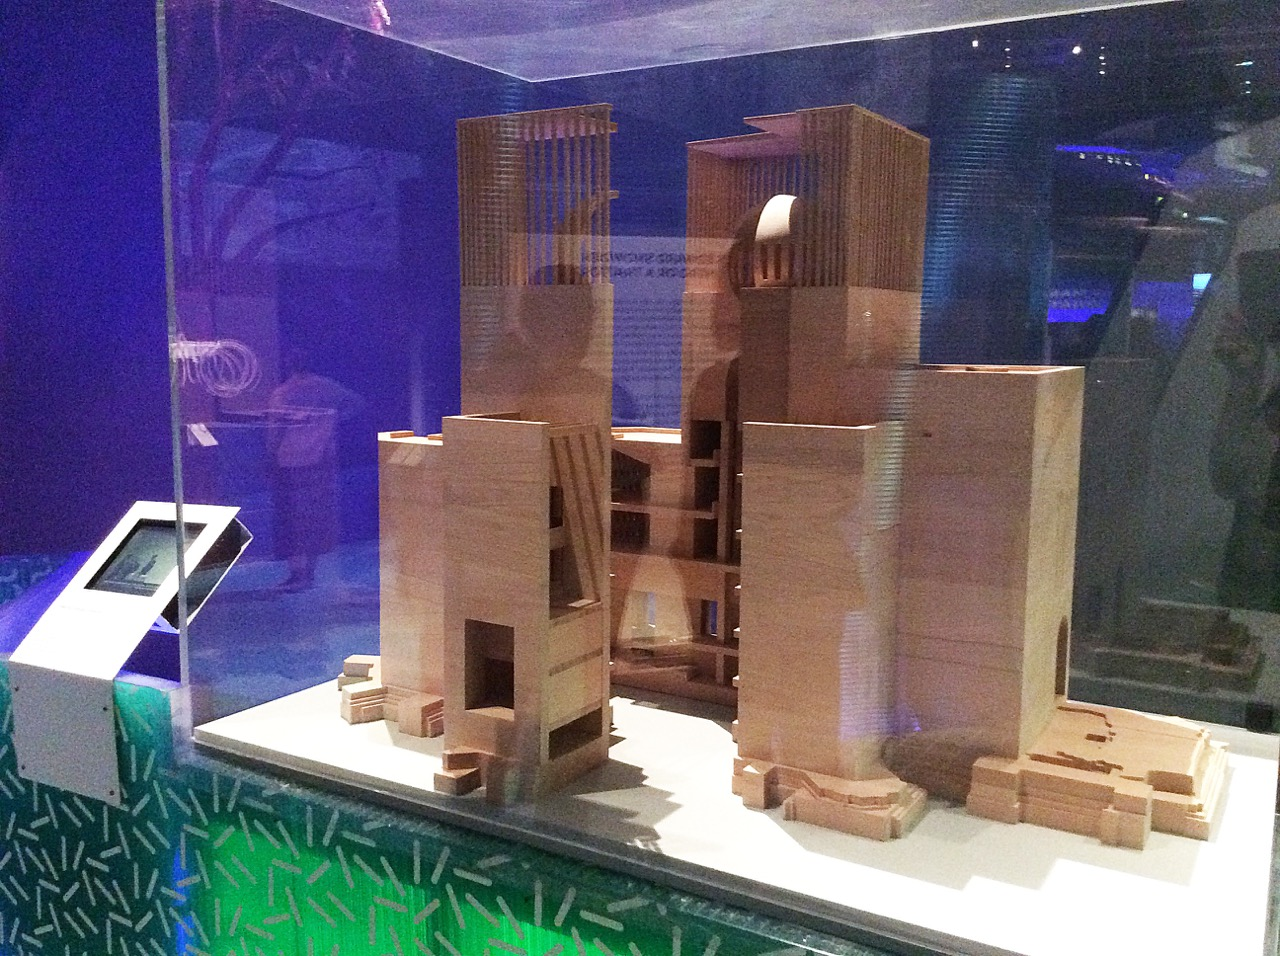 "Modell des House of One in der Ausstellung ""The Future Starts Here"" im Victoria & Albert Museum, London"